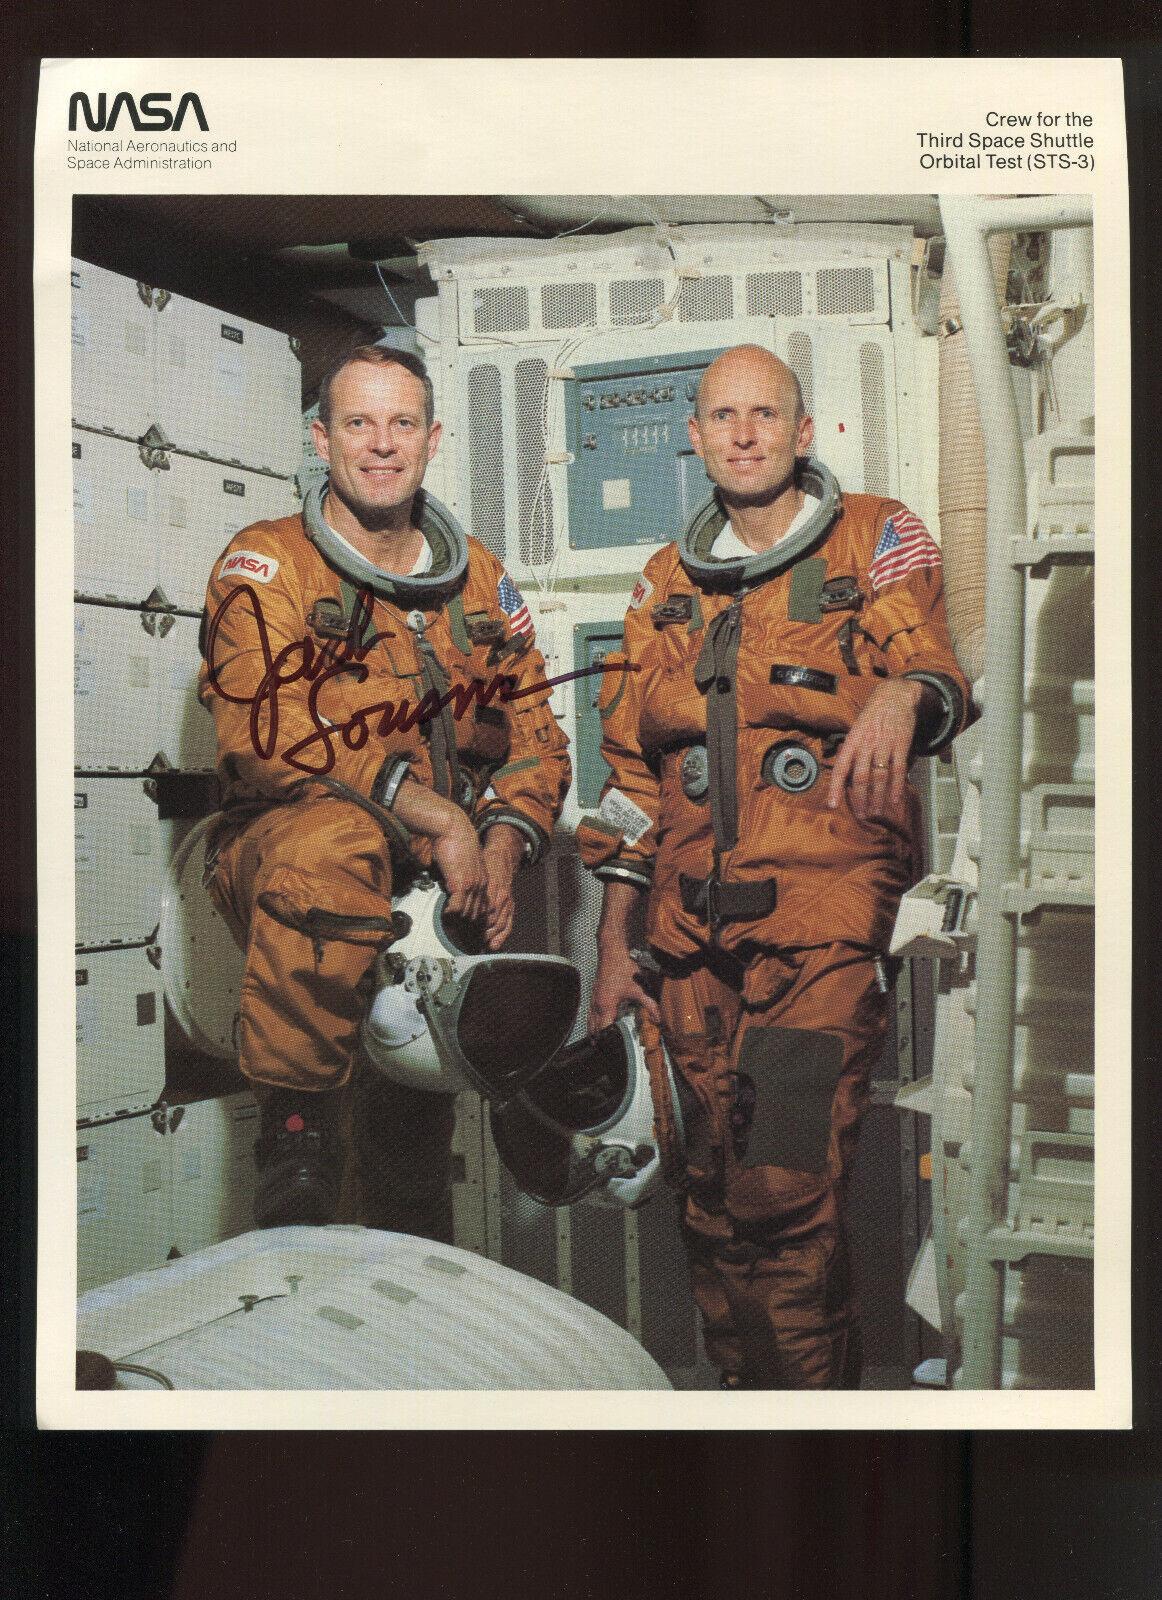 s l1600 - Space Shuttle STS-3 ASTRONAUT Jack Lousma SIGNED AUROGRAPH LOT OF 8 ITEMS!!!